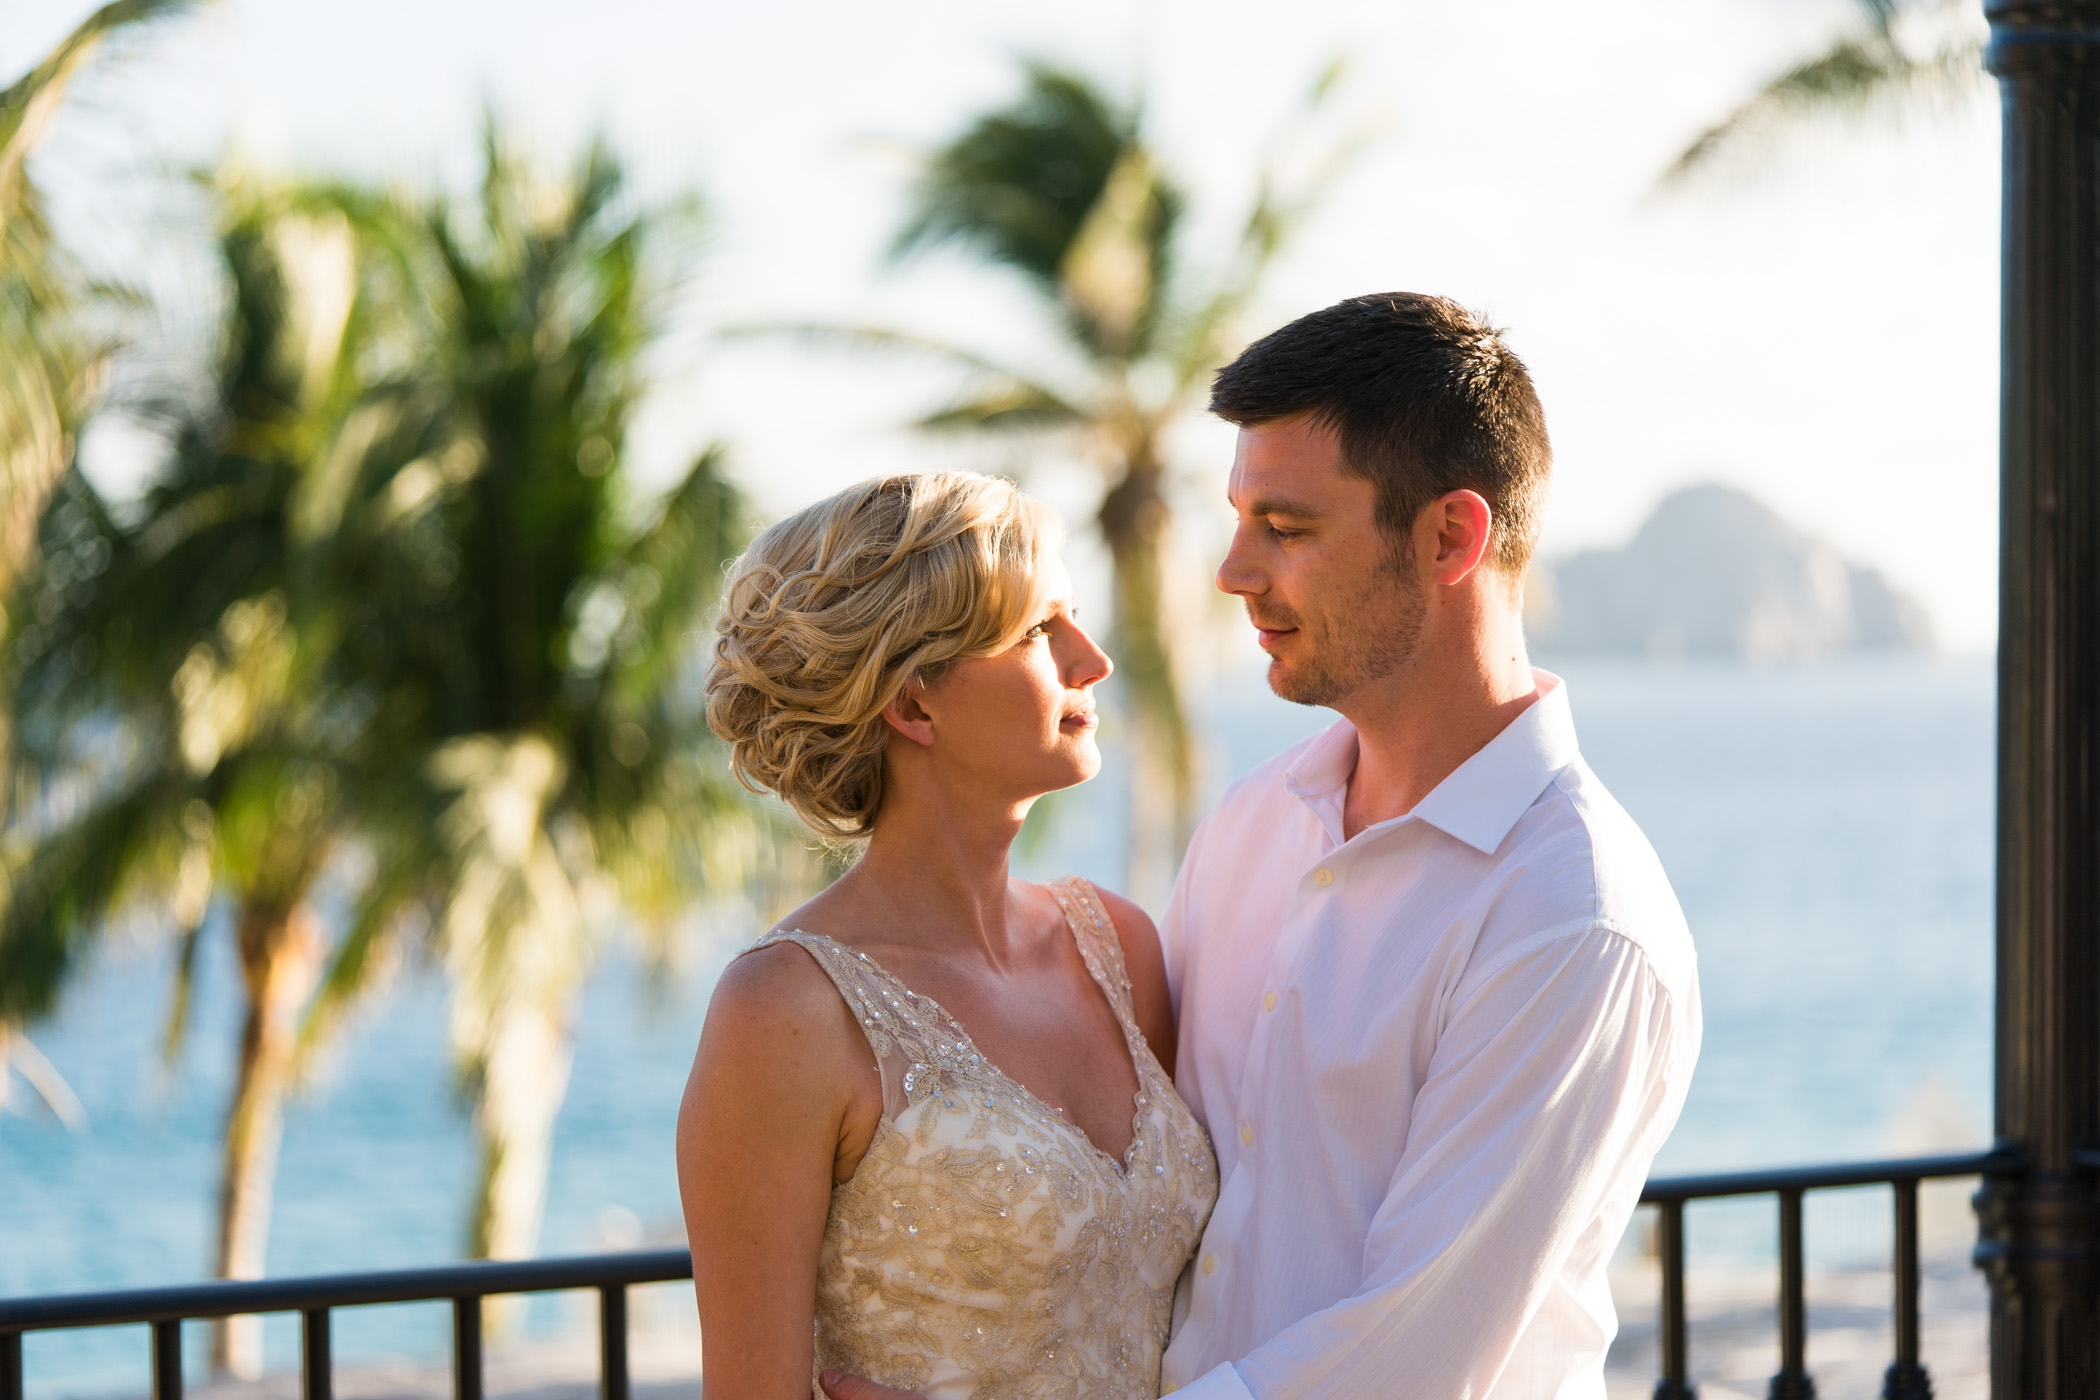 tiffanyterrancewedding-22.jpg